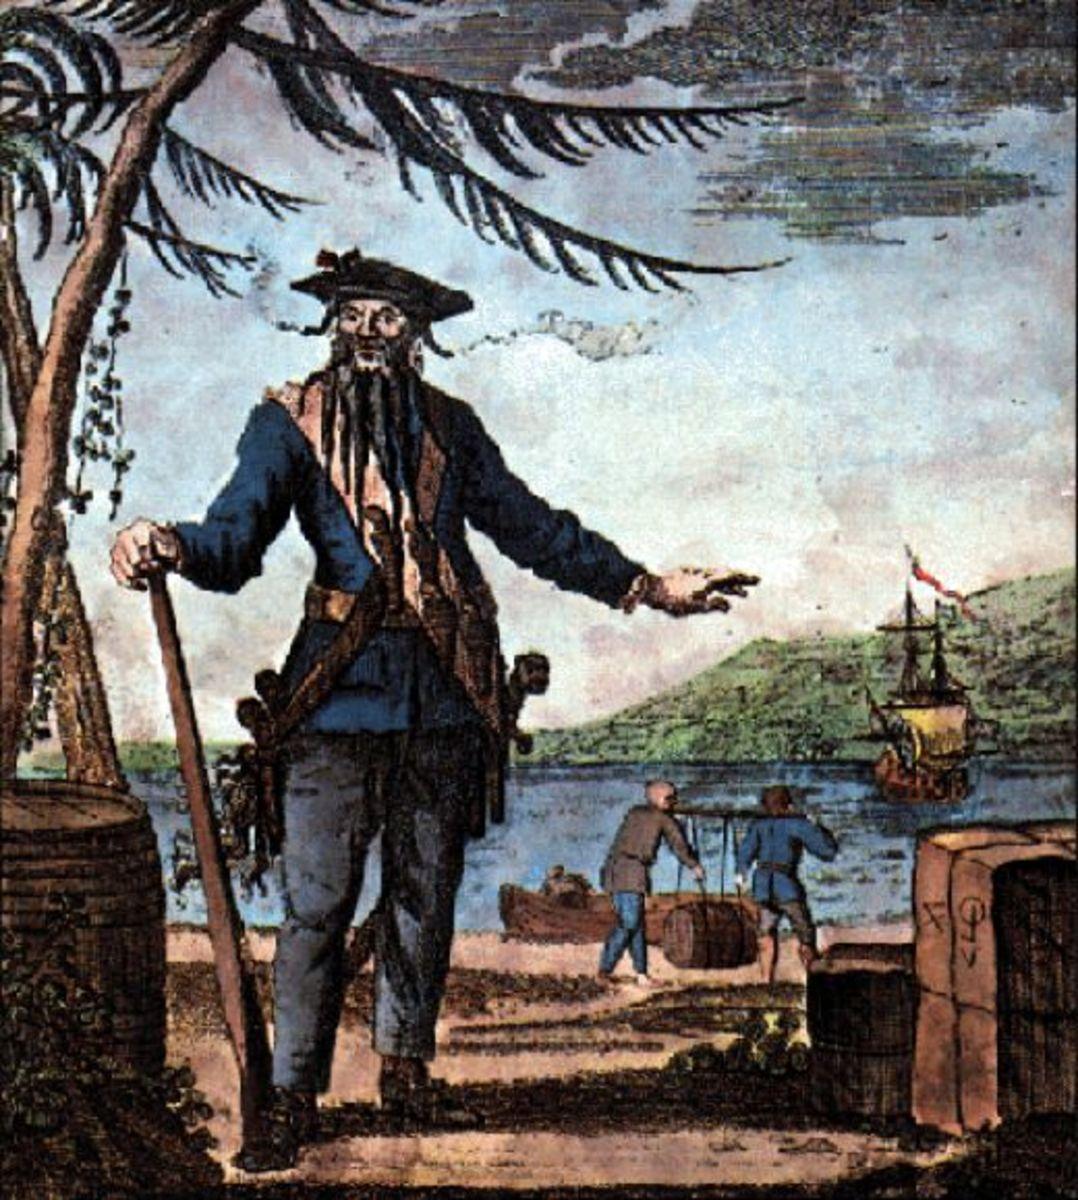 Ocracoke Island and especially the beach area near the lighthouse was a favorite area of Blackbeard's